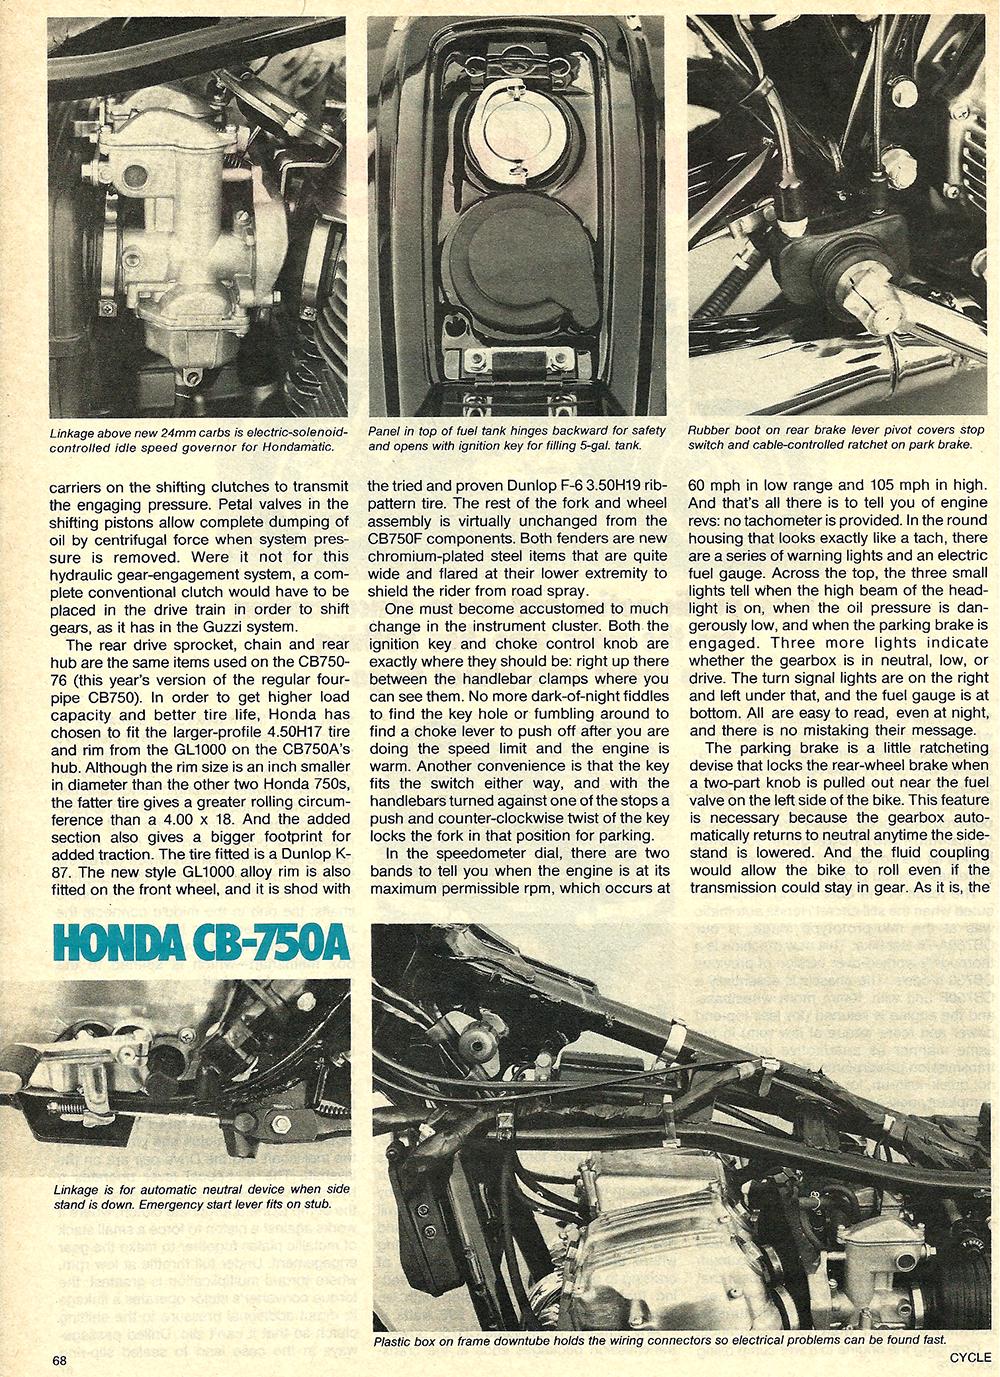 1976 Honda CB750A road test 3.JPG